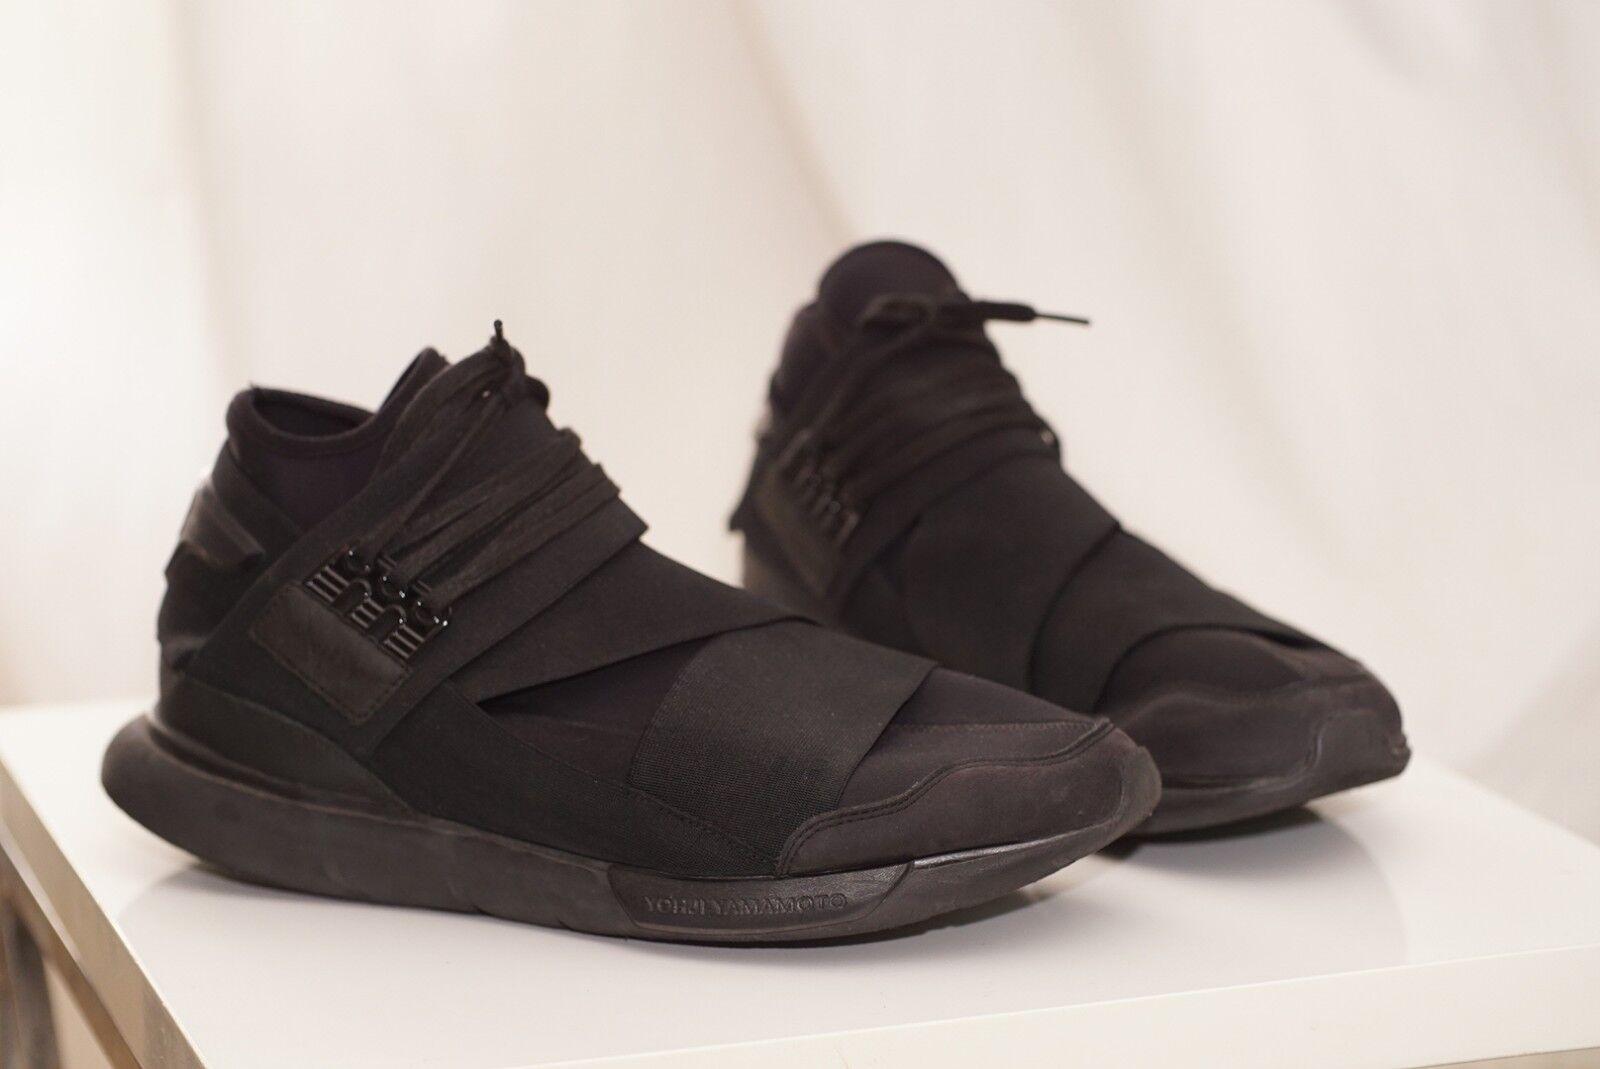 Adidas Y-3 Qasa High Triple Black sz. 12